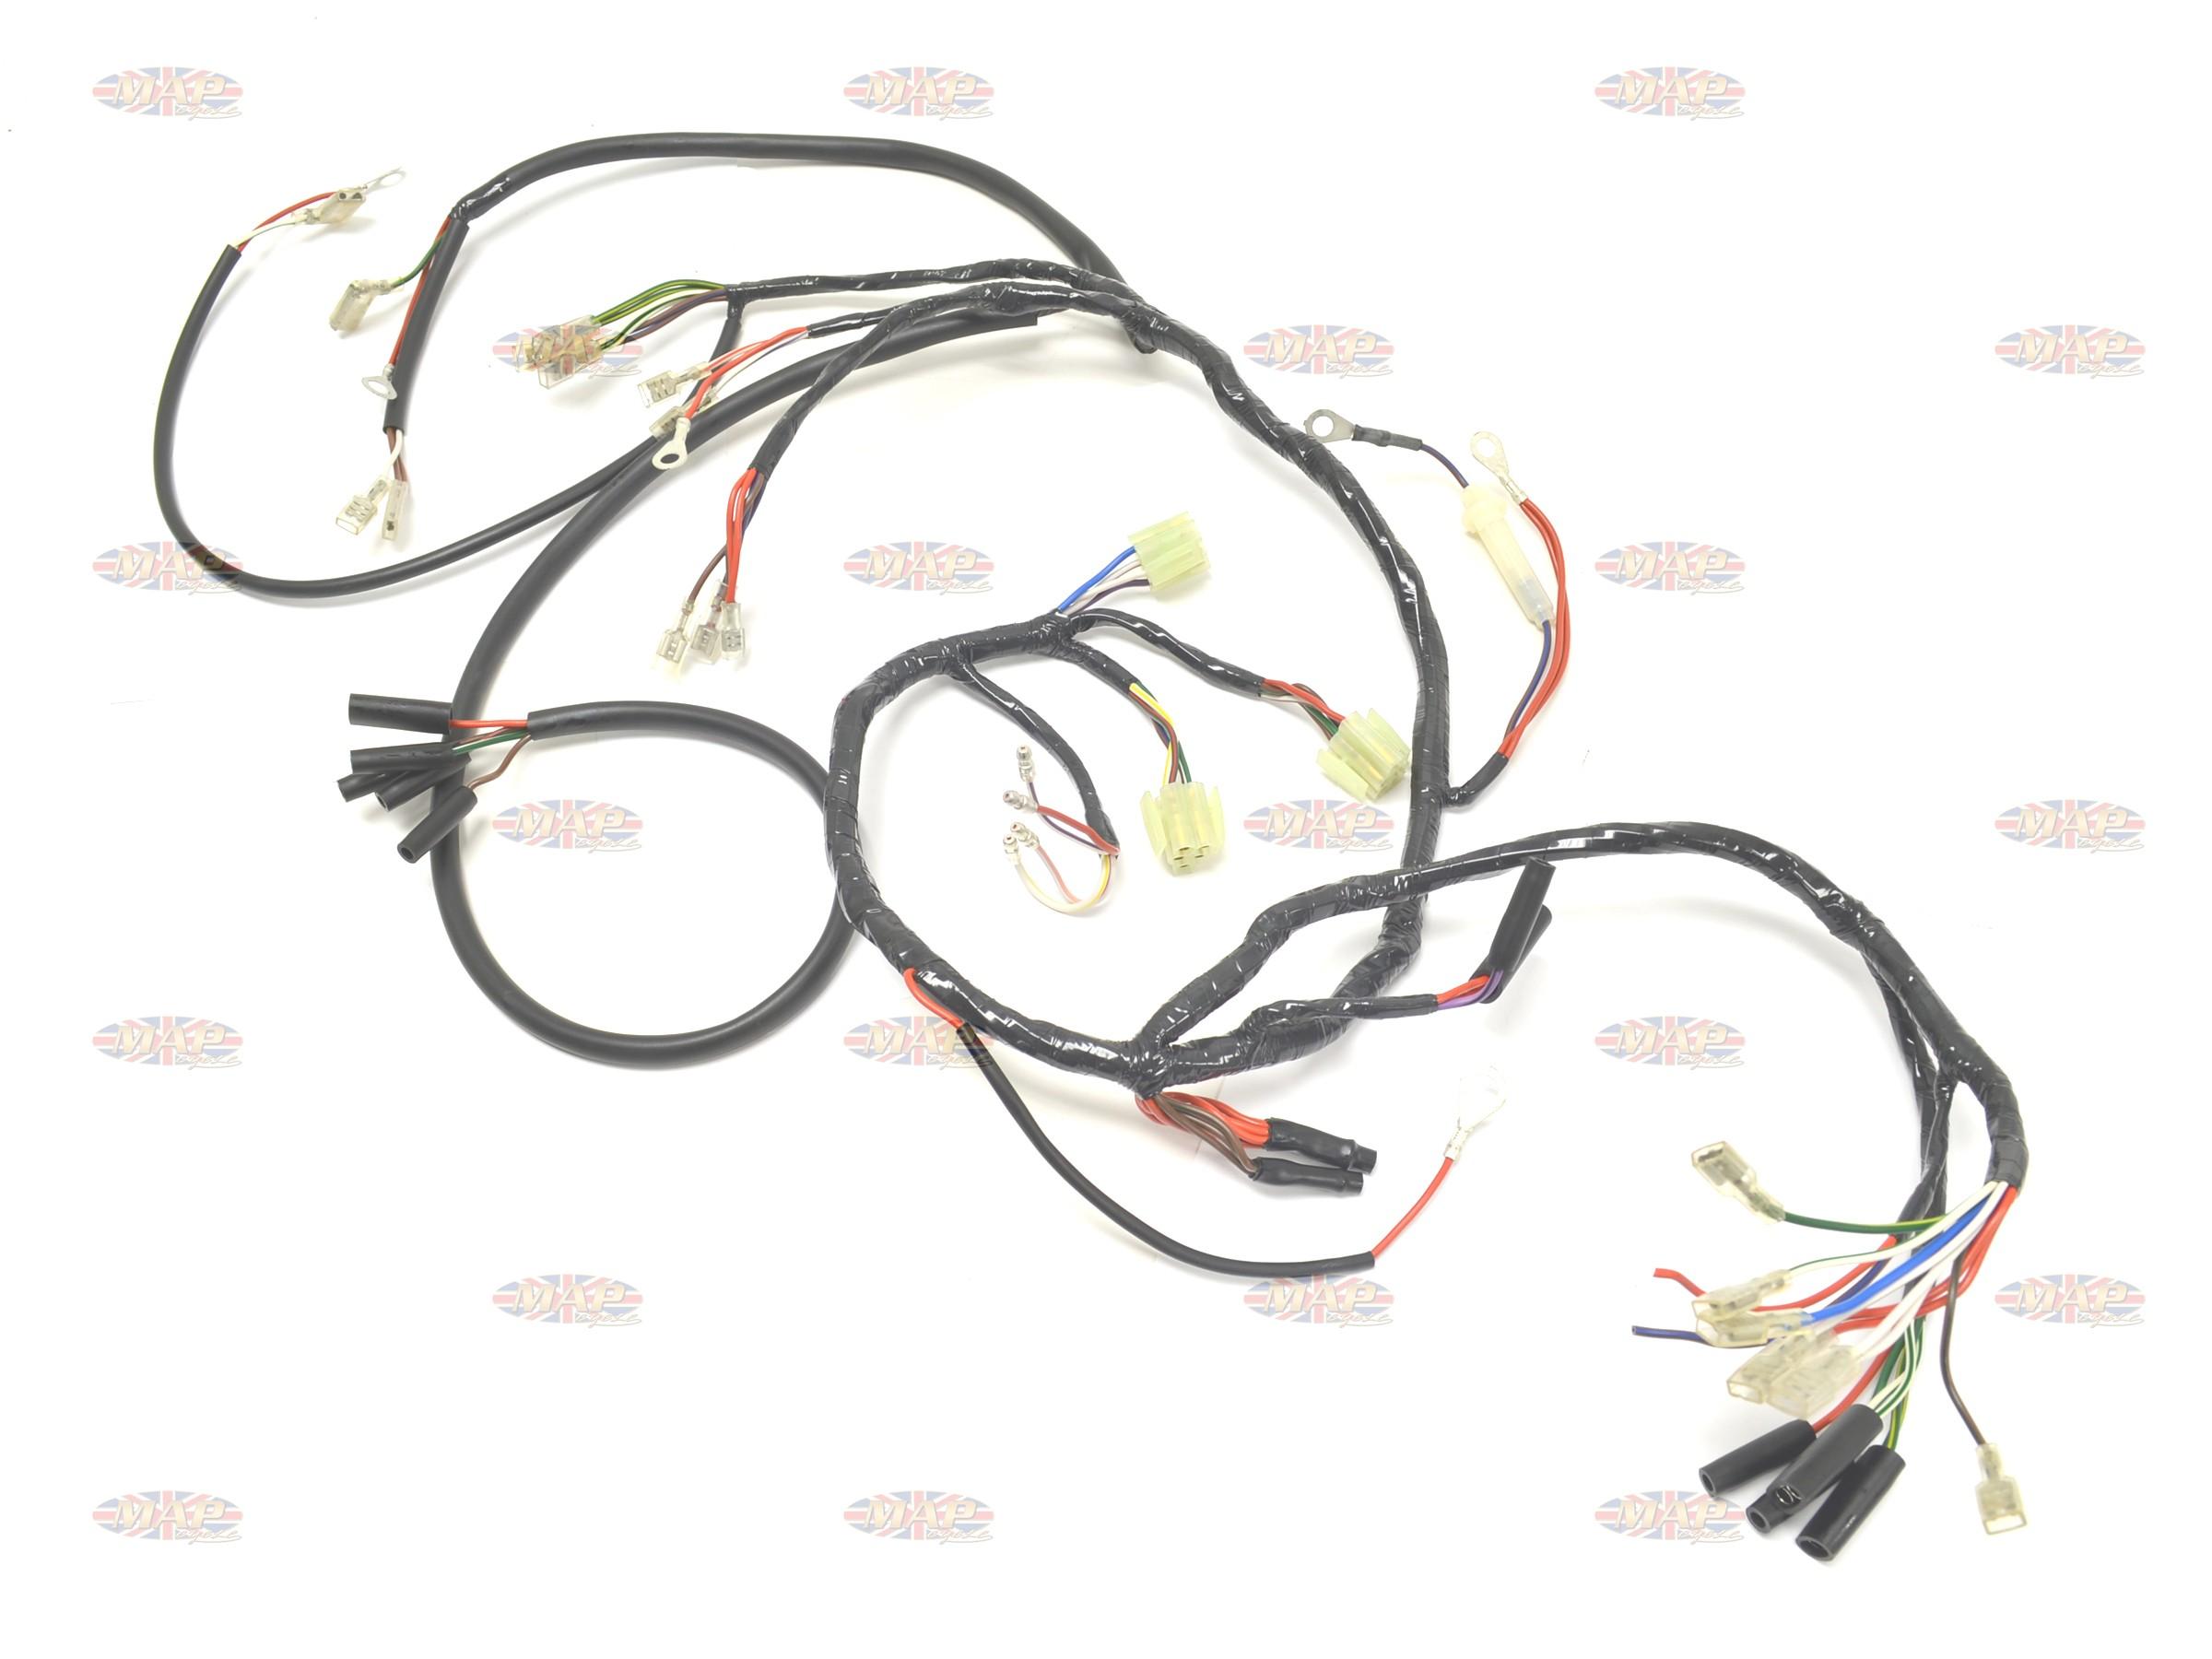 Admirable Norton Commando 1975 77 Mkiii Main Wiring Harness Wiring Digital Resources Unprprontobusorg